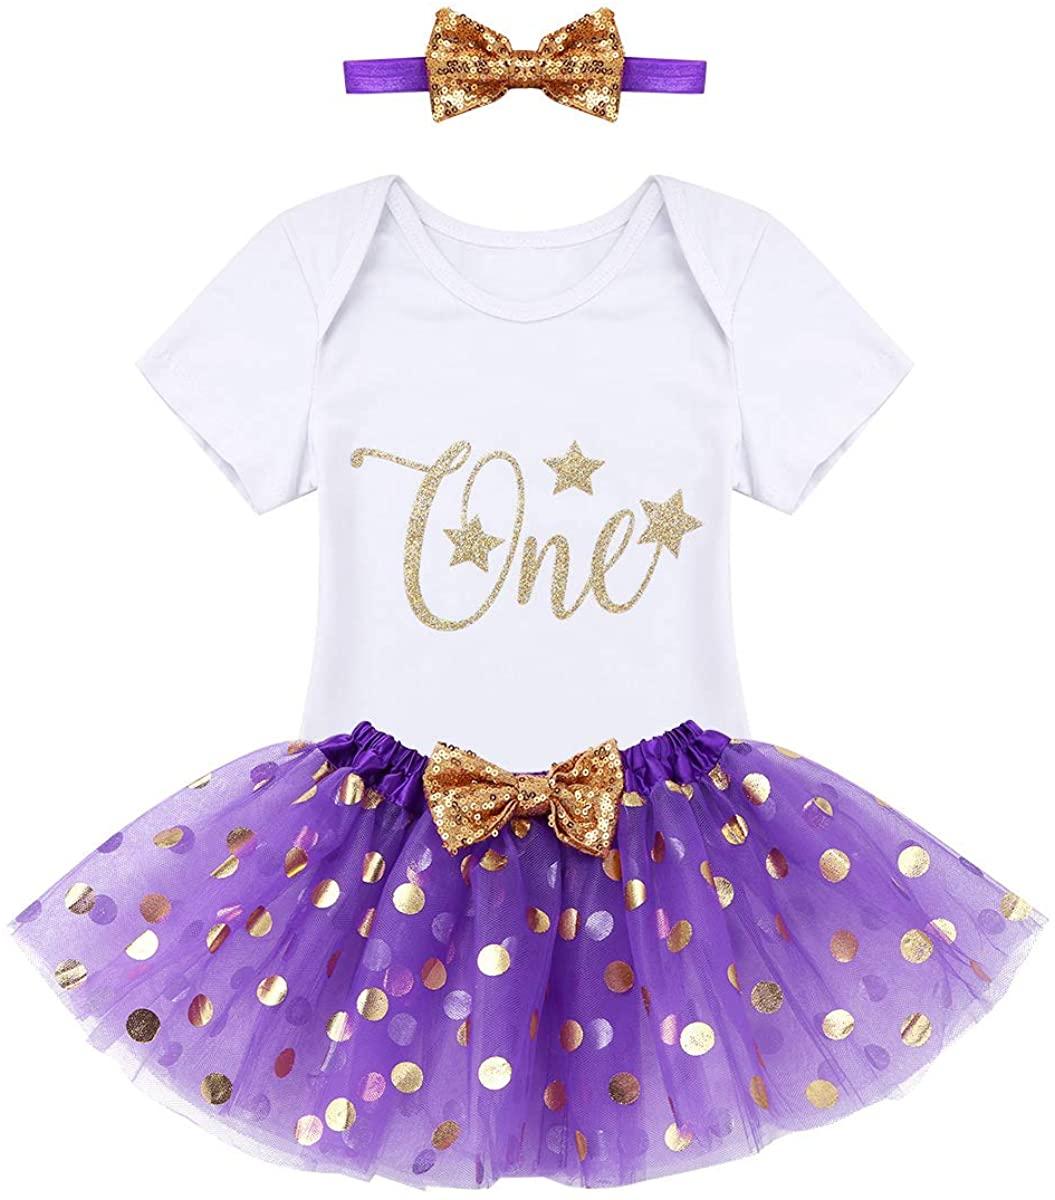 Freebily Toddlers Girls 3PCS Glittery 1st Birthday Romper with Polka Dots Tutu Skirts and Headband Set